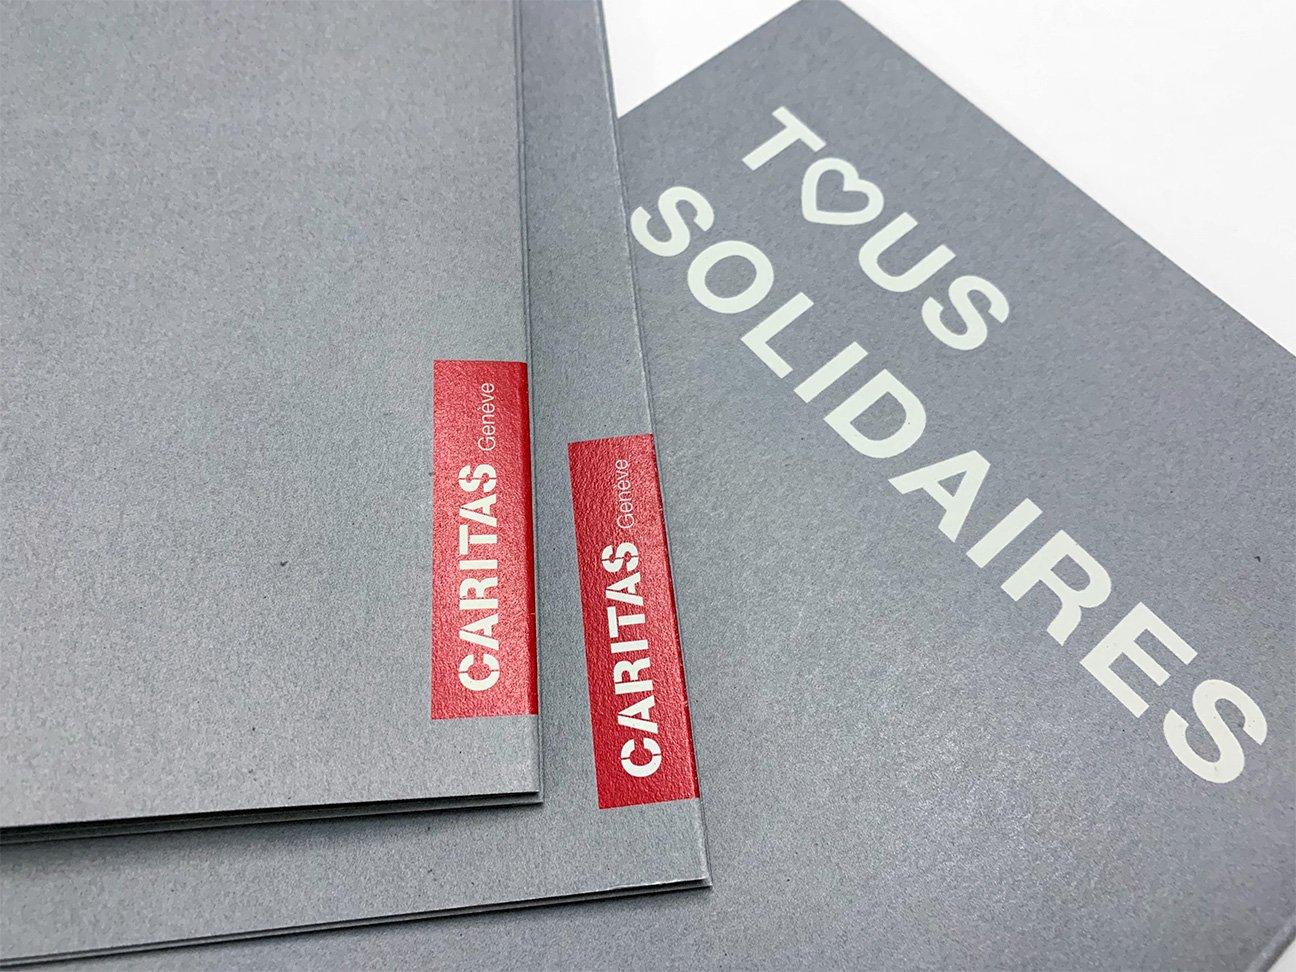 fabien_cuffel_graphisme_typographie_Brochure_Caritas_Geneve_ok